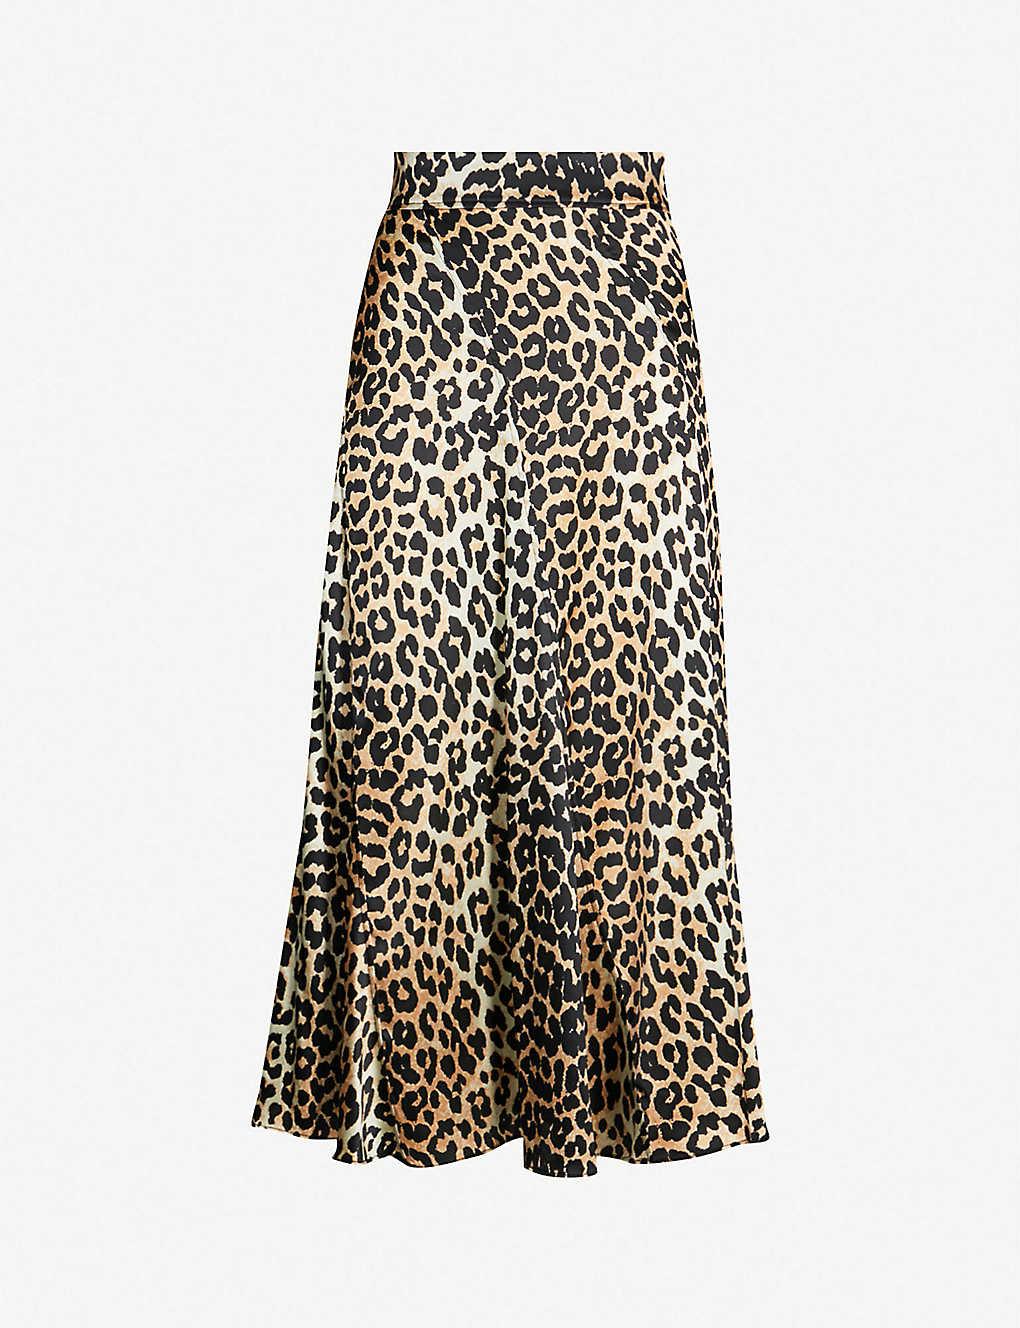 32b359c1e3afb6 GANNI - Blakely leopard-print flared stretch-silk skirt | Selfridges.com